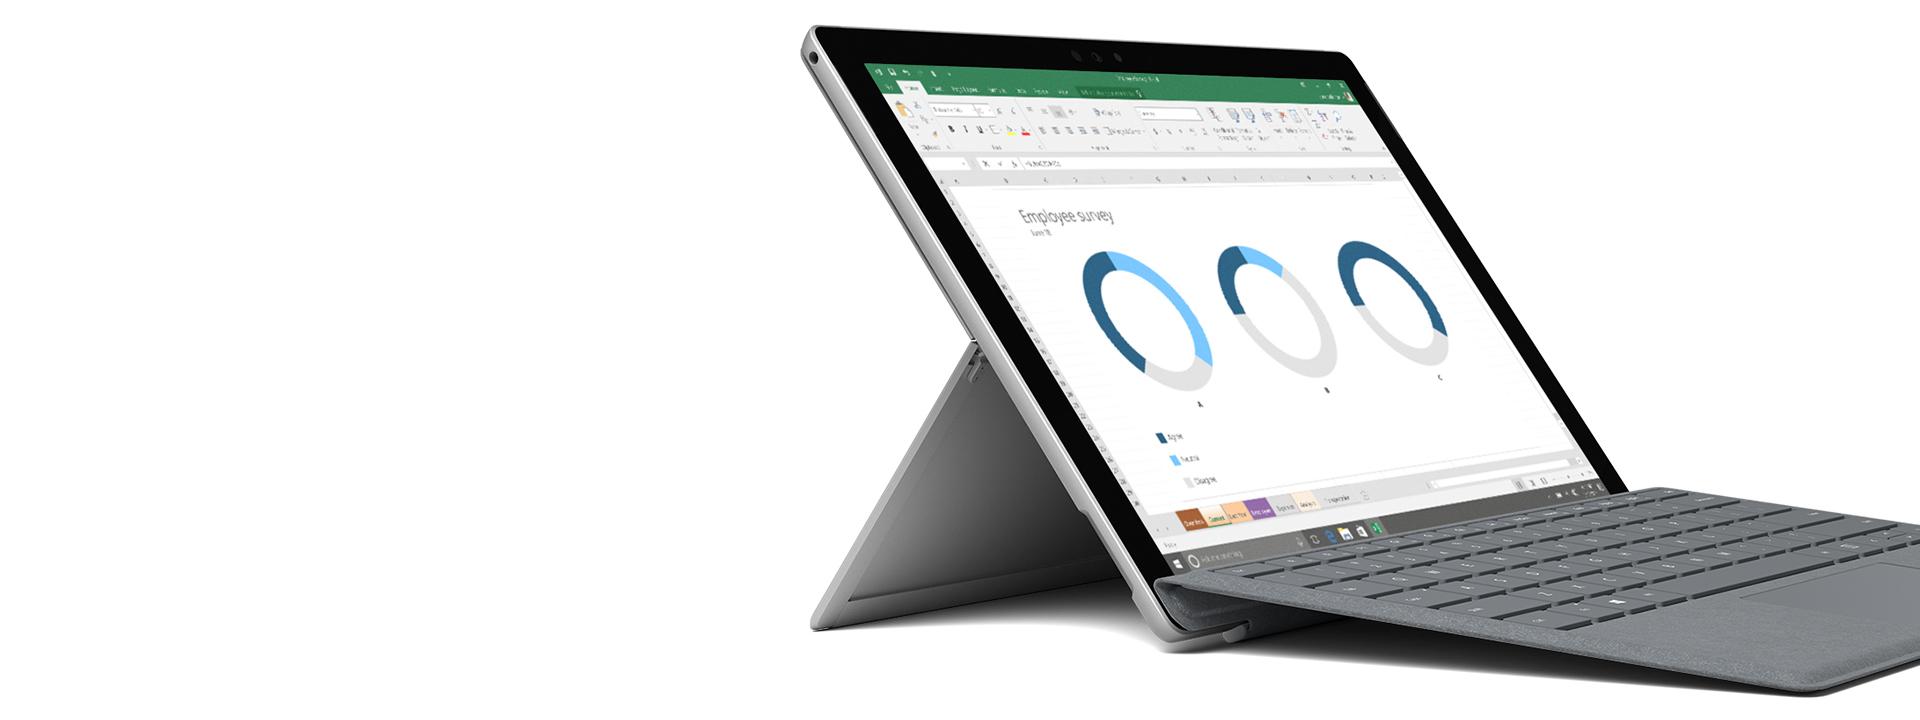 Surface-Gerät mit Windows/Office-Screenshot.